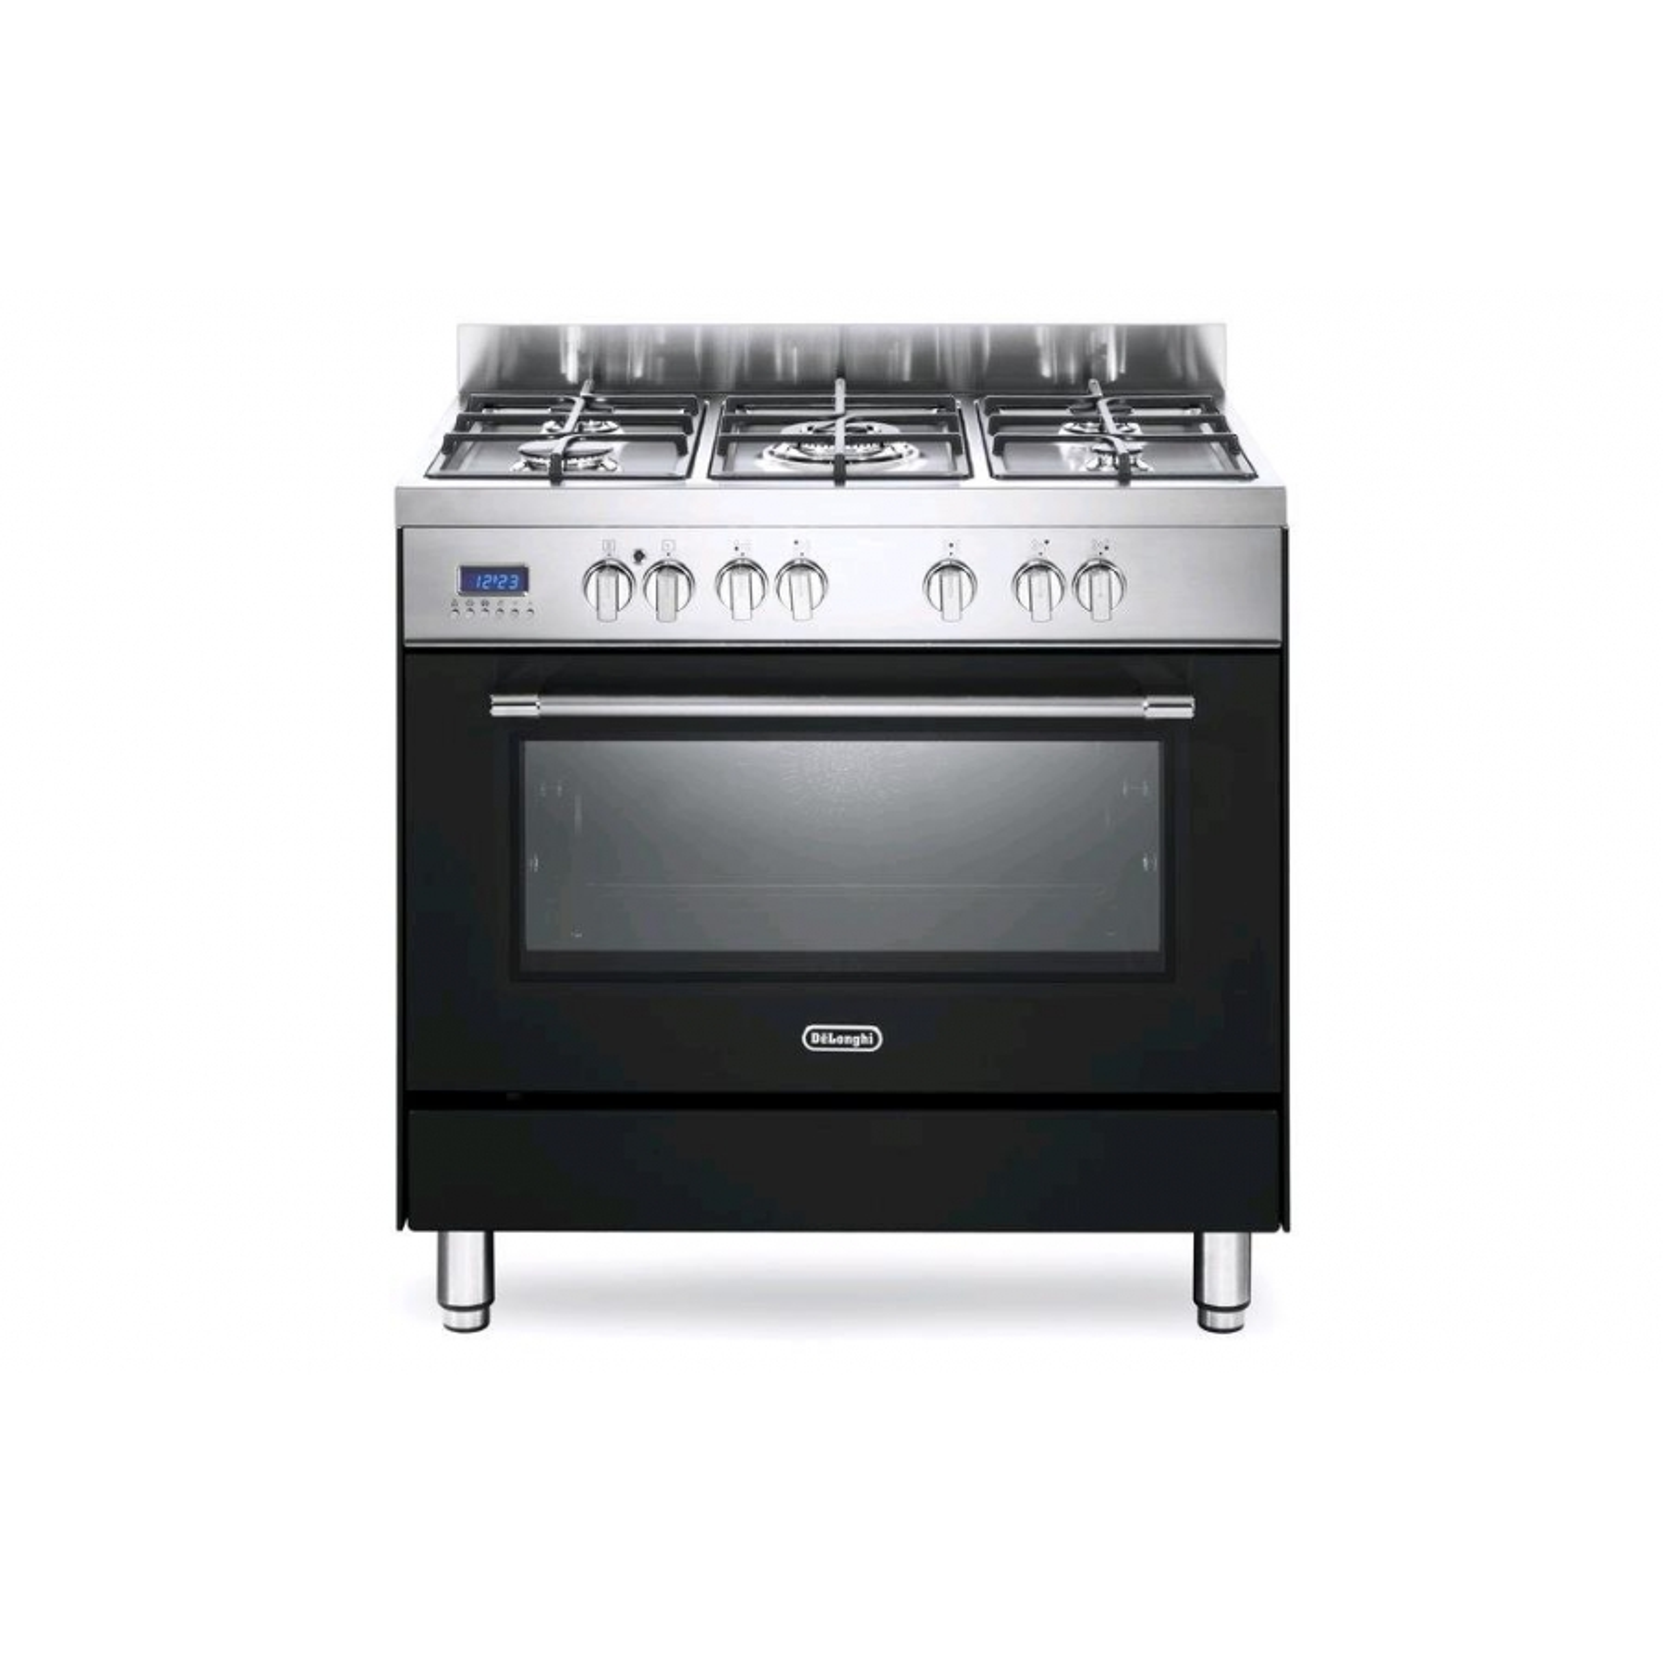 De longhi pro96ma cucina a gas forno elettrico multifunzione 90x60cm classe a antracite garanzia - Cucine a gas samsung ...